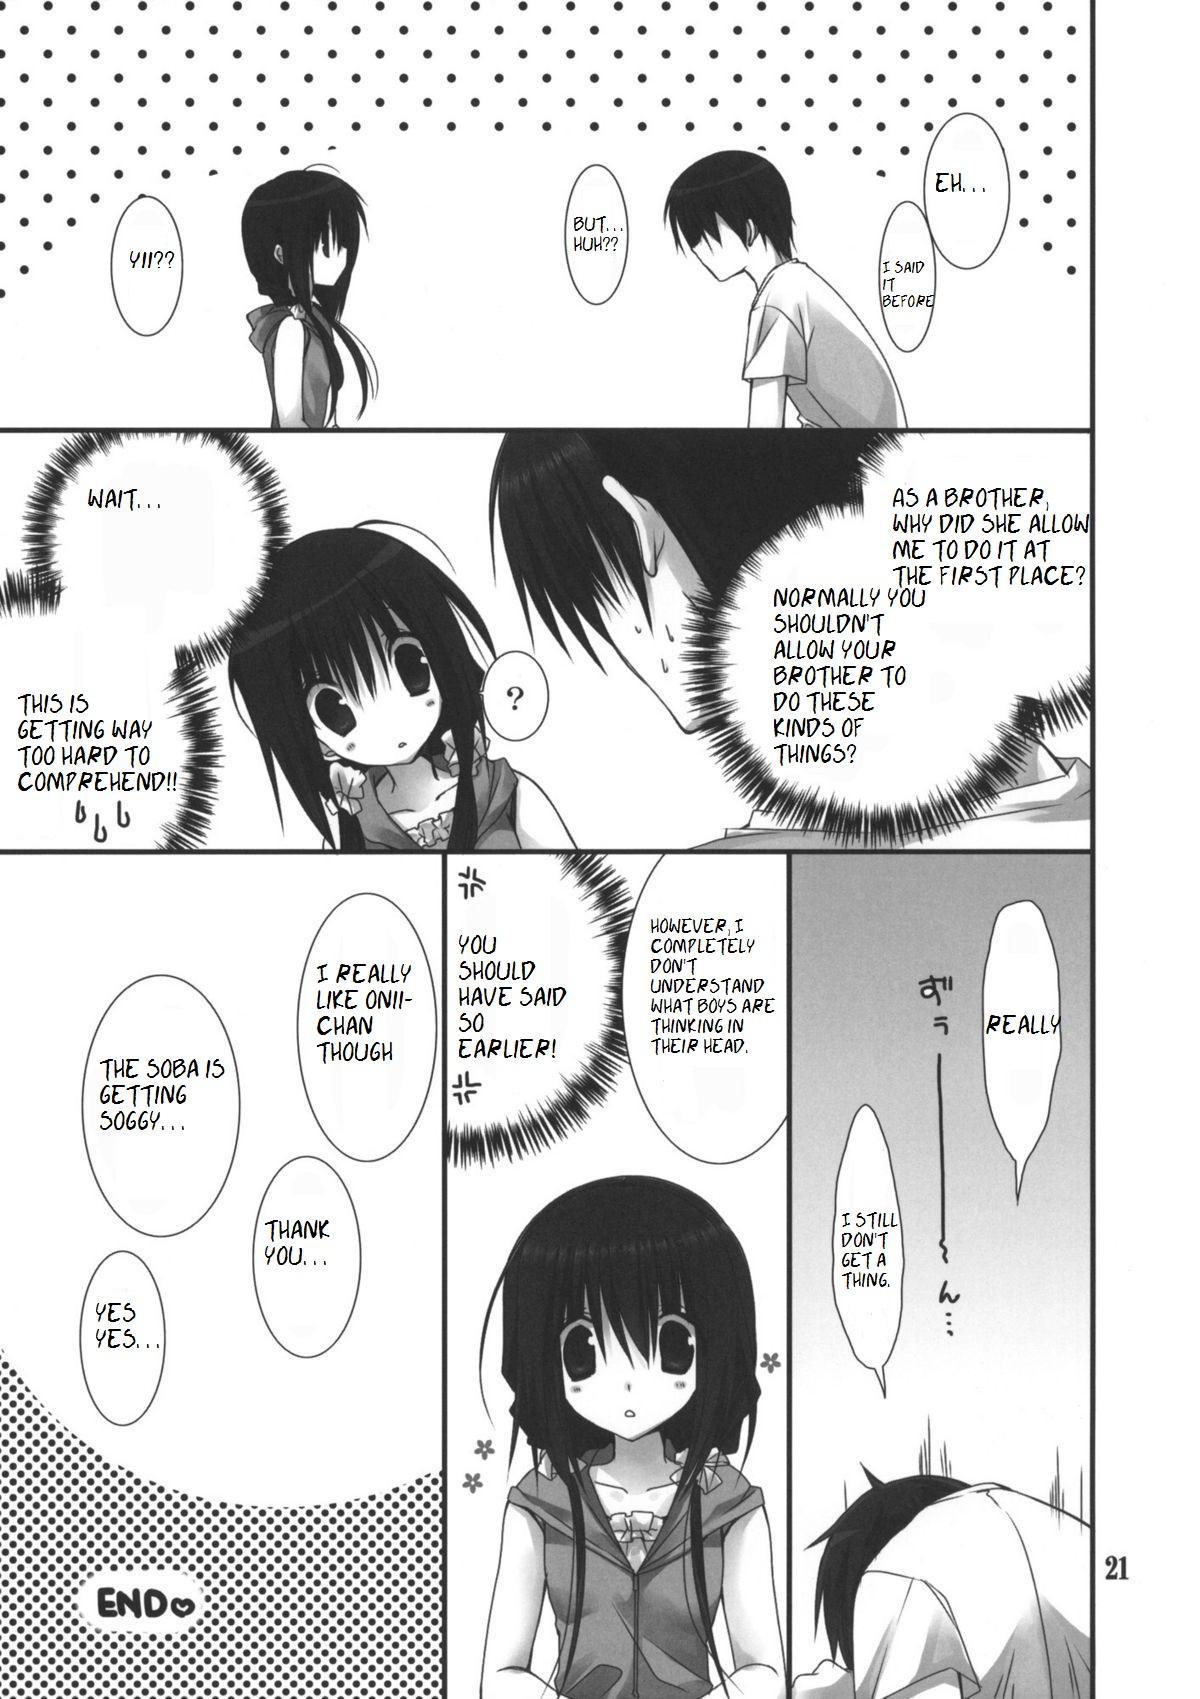 Imouto no Otetsudai 3 | Little Sister Helper 3 18